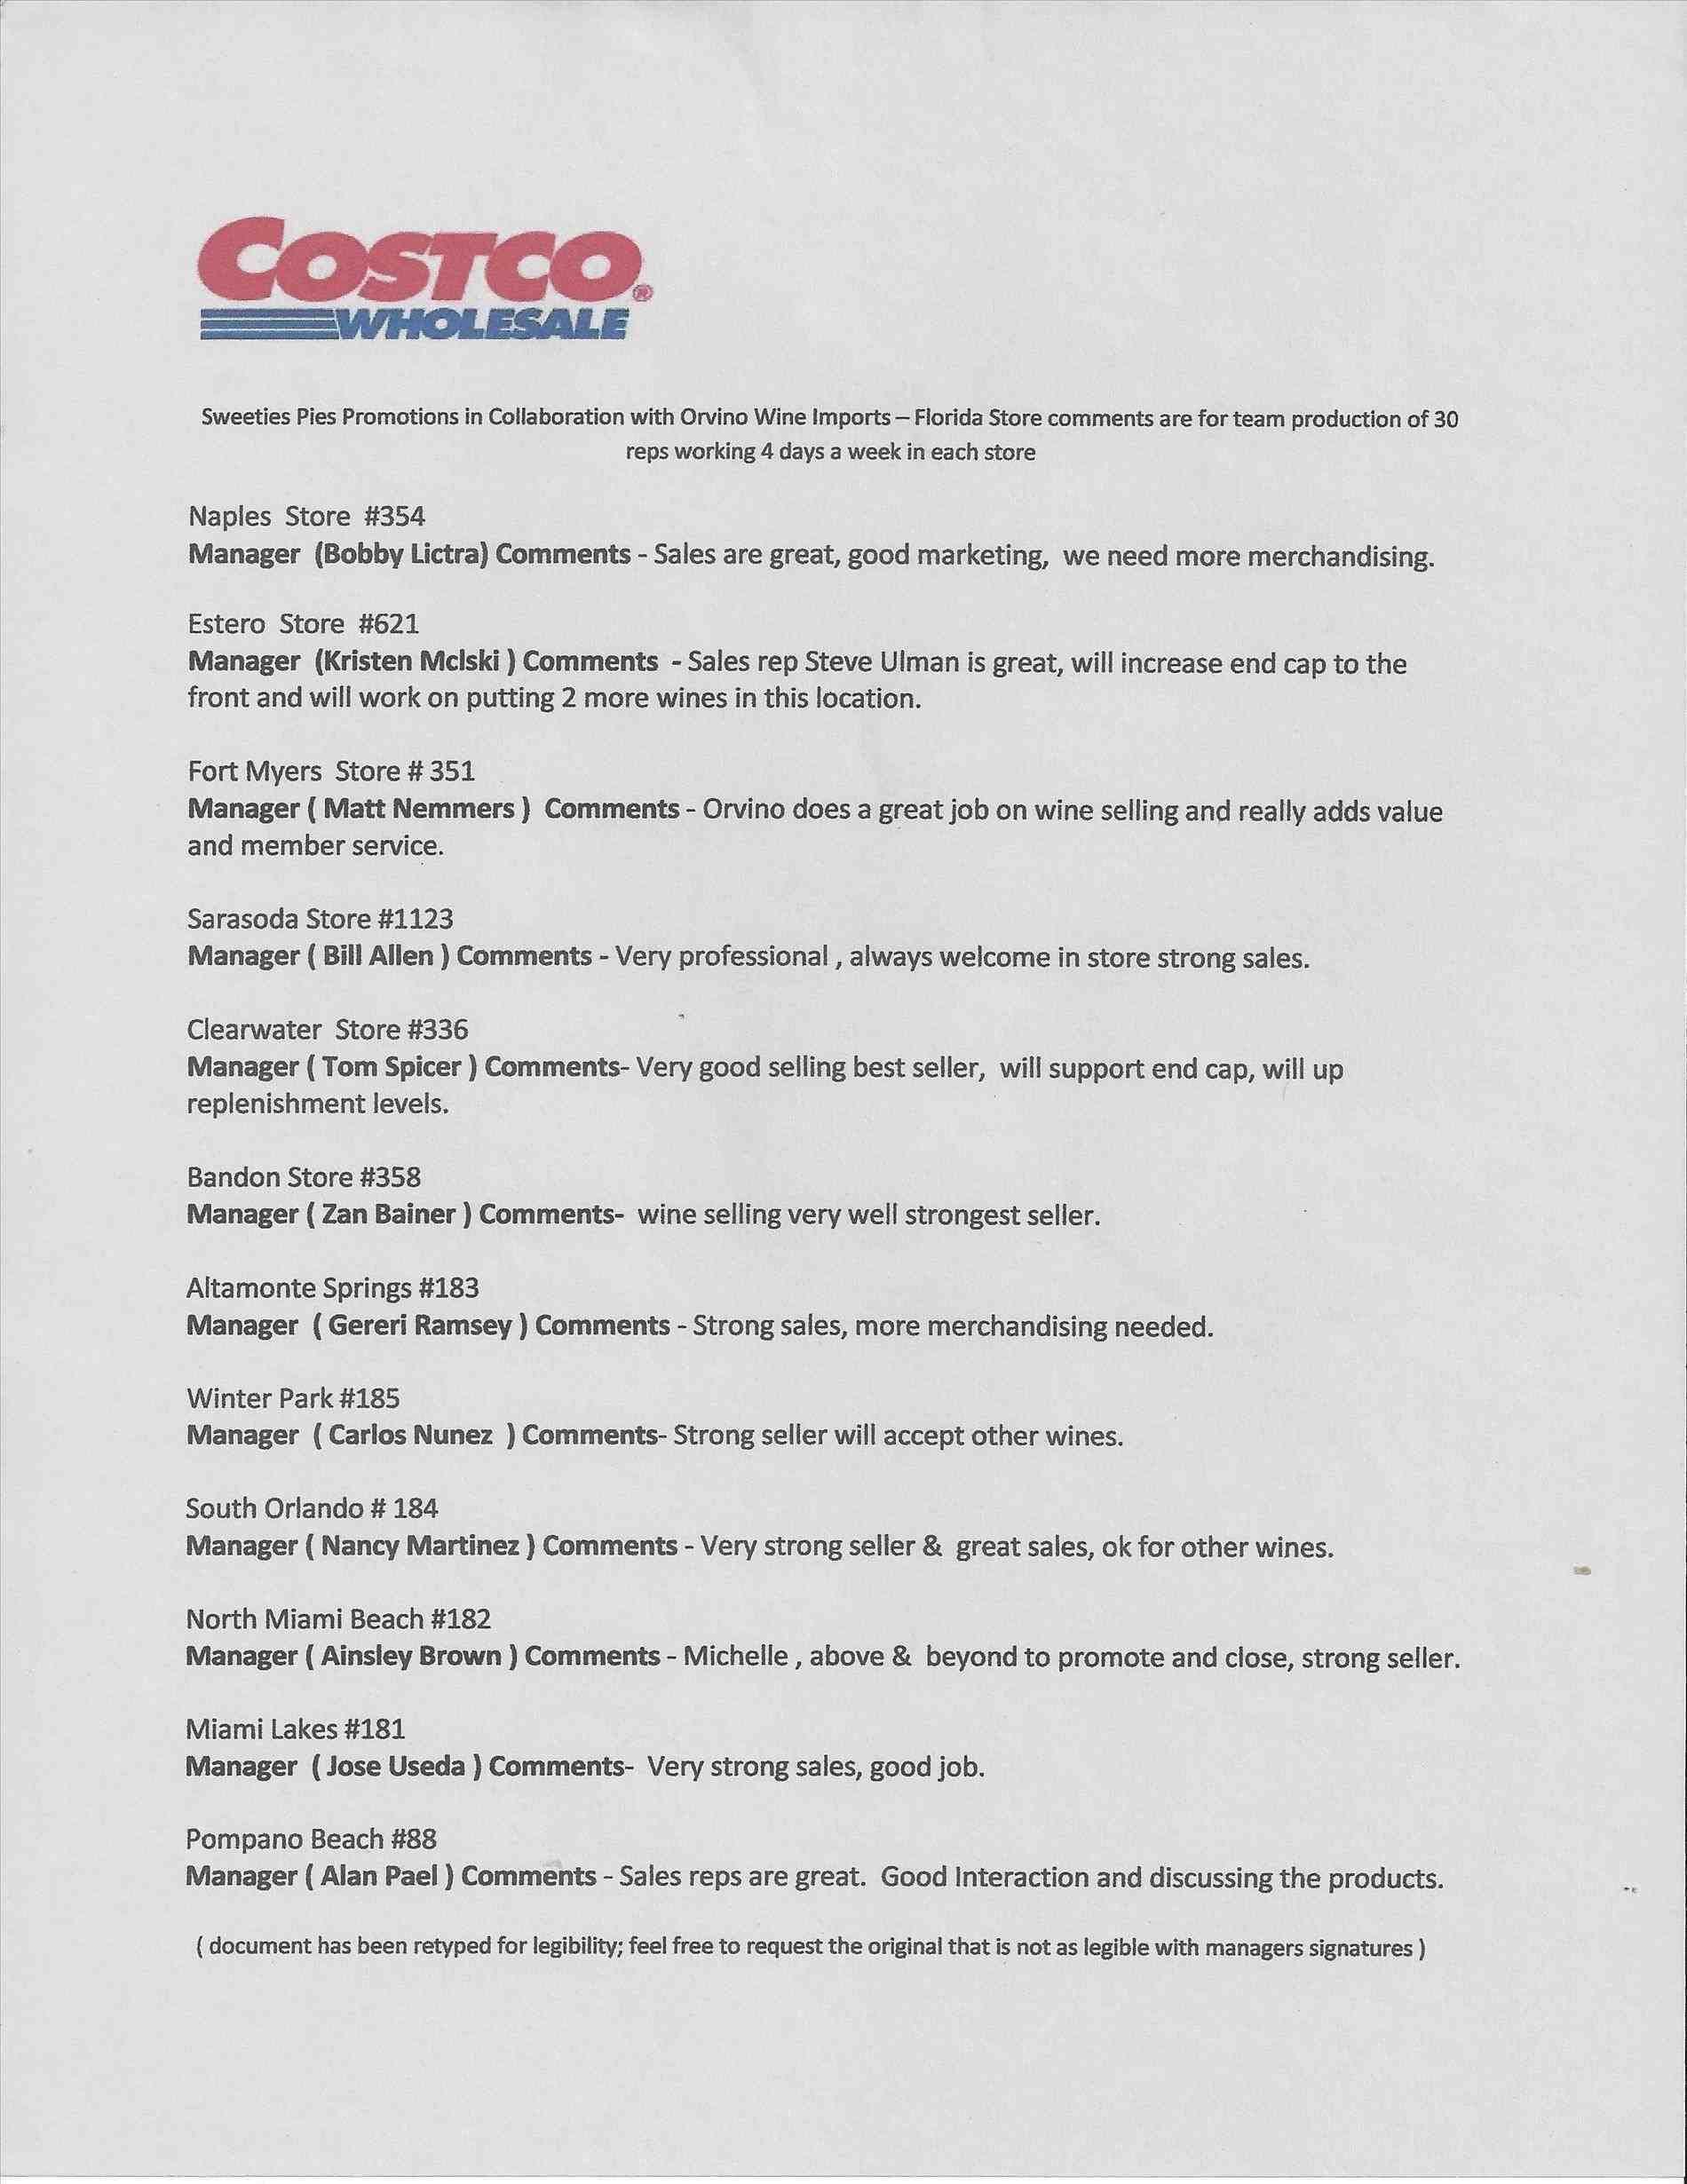 Costco Sample Resume For Costco Resume Insssrenterprisesco Pharmacy Intern Badak Pharmacy Sample Resume For Costco Intern Resume Ba Resume Sample Resume Costco